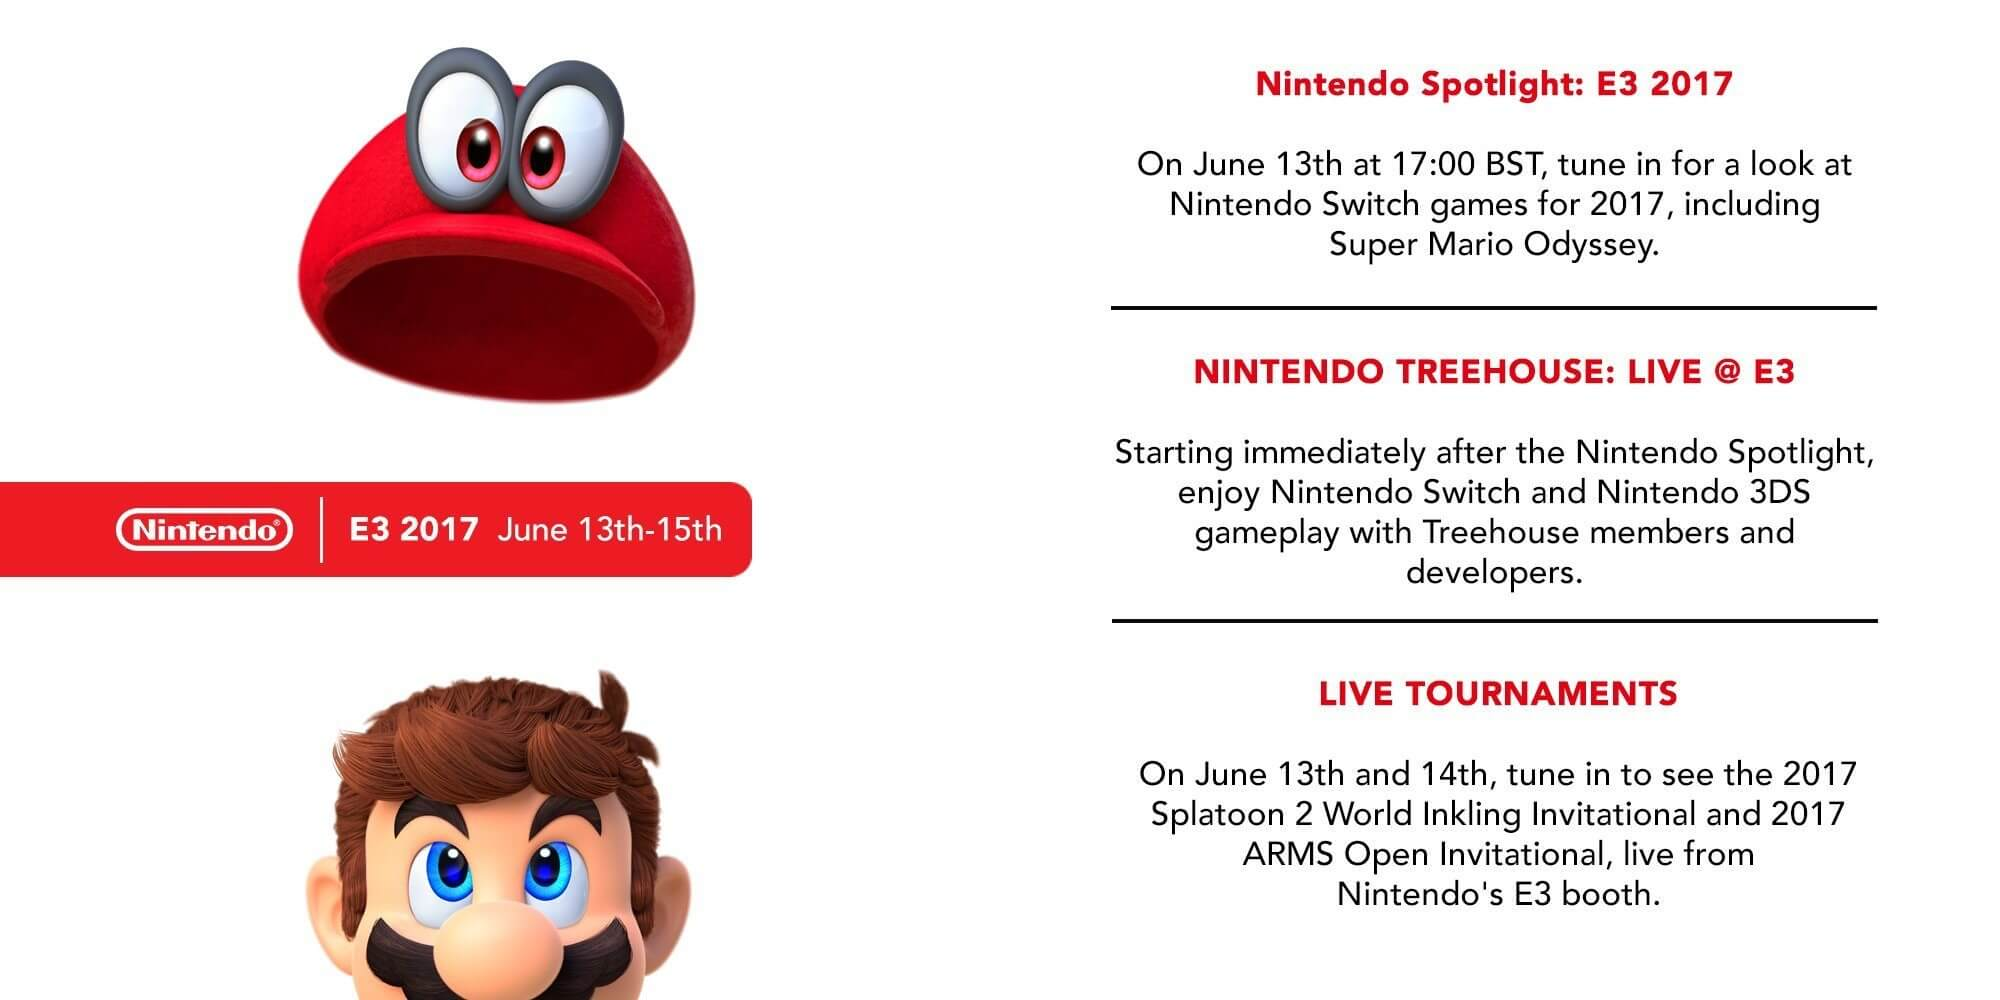 3231590 6311023355 C i1sKEWAAA6rce - O que esperar da Nintendo na E3 2017